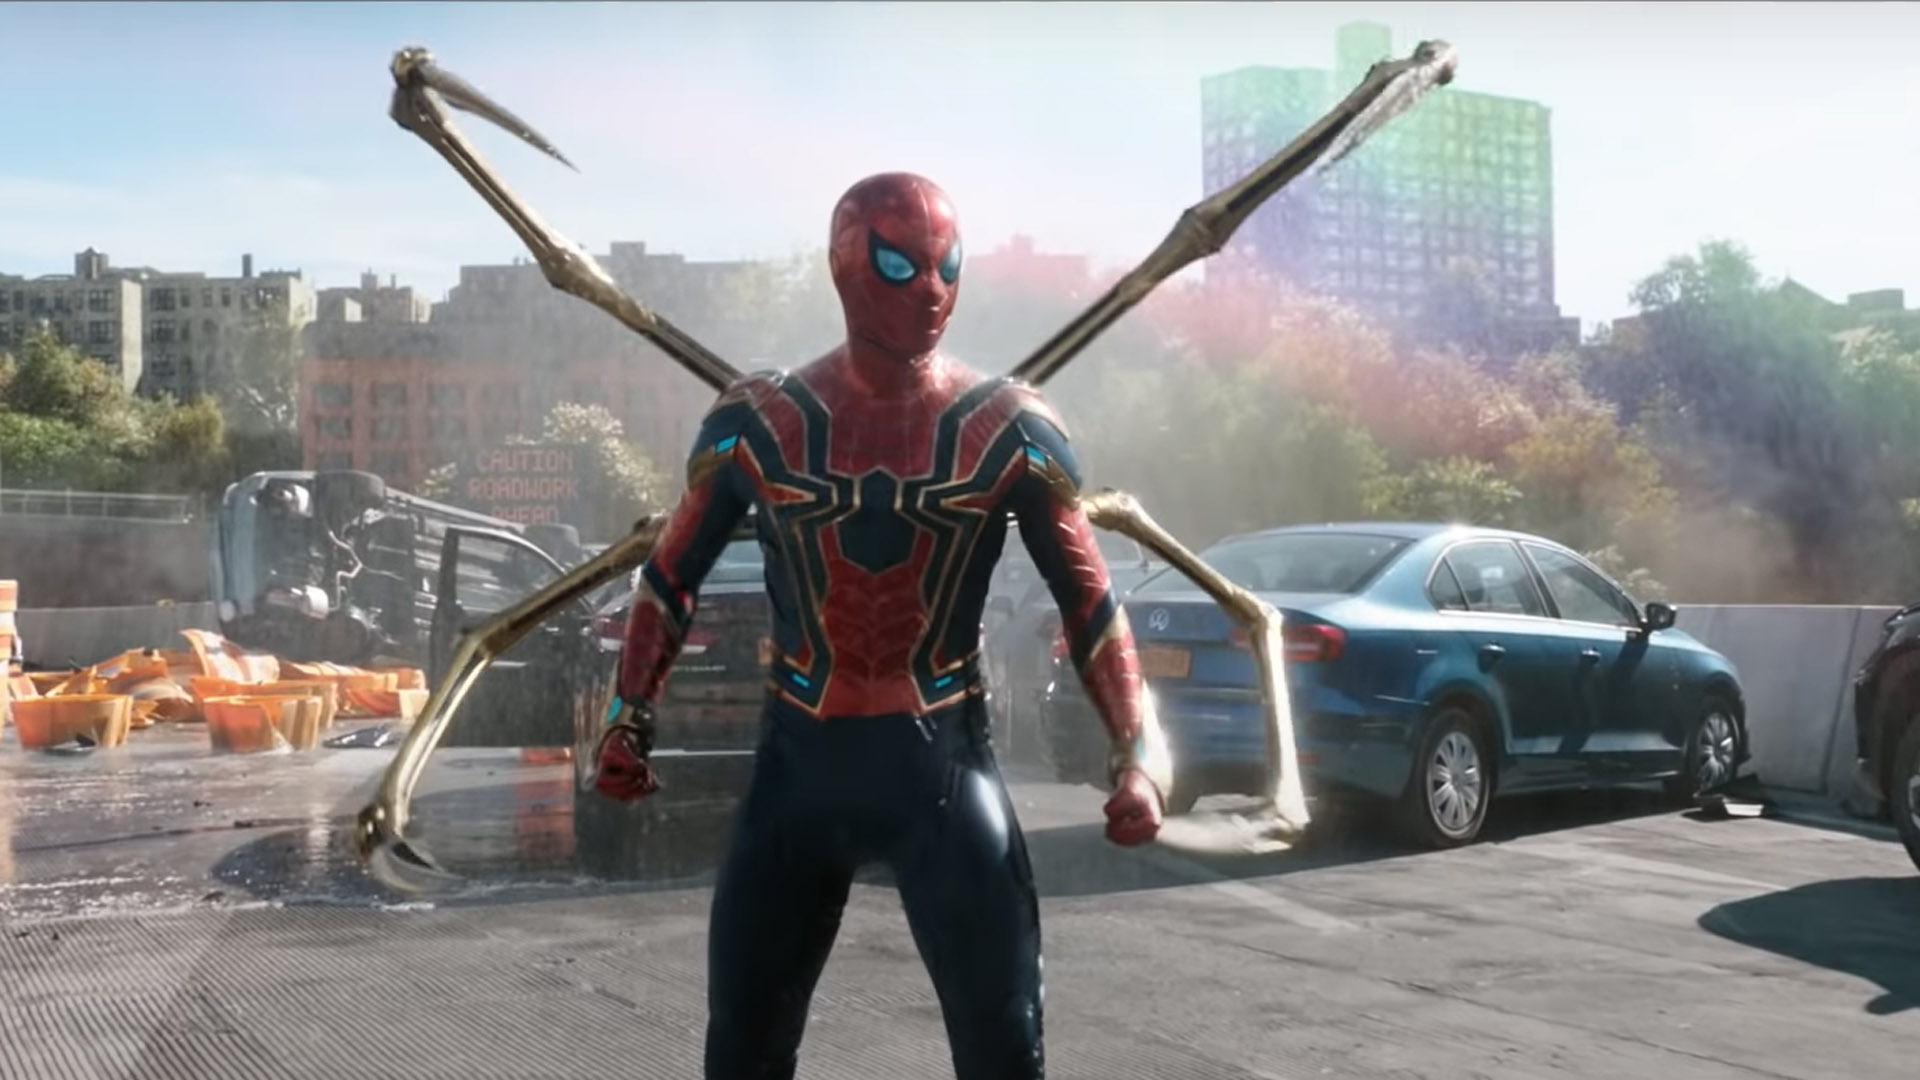 Spider-Man: No Way Home IMAX trailer